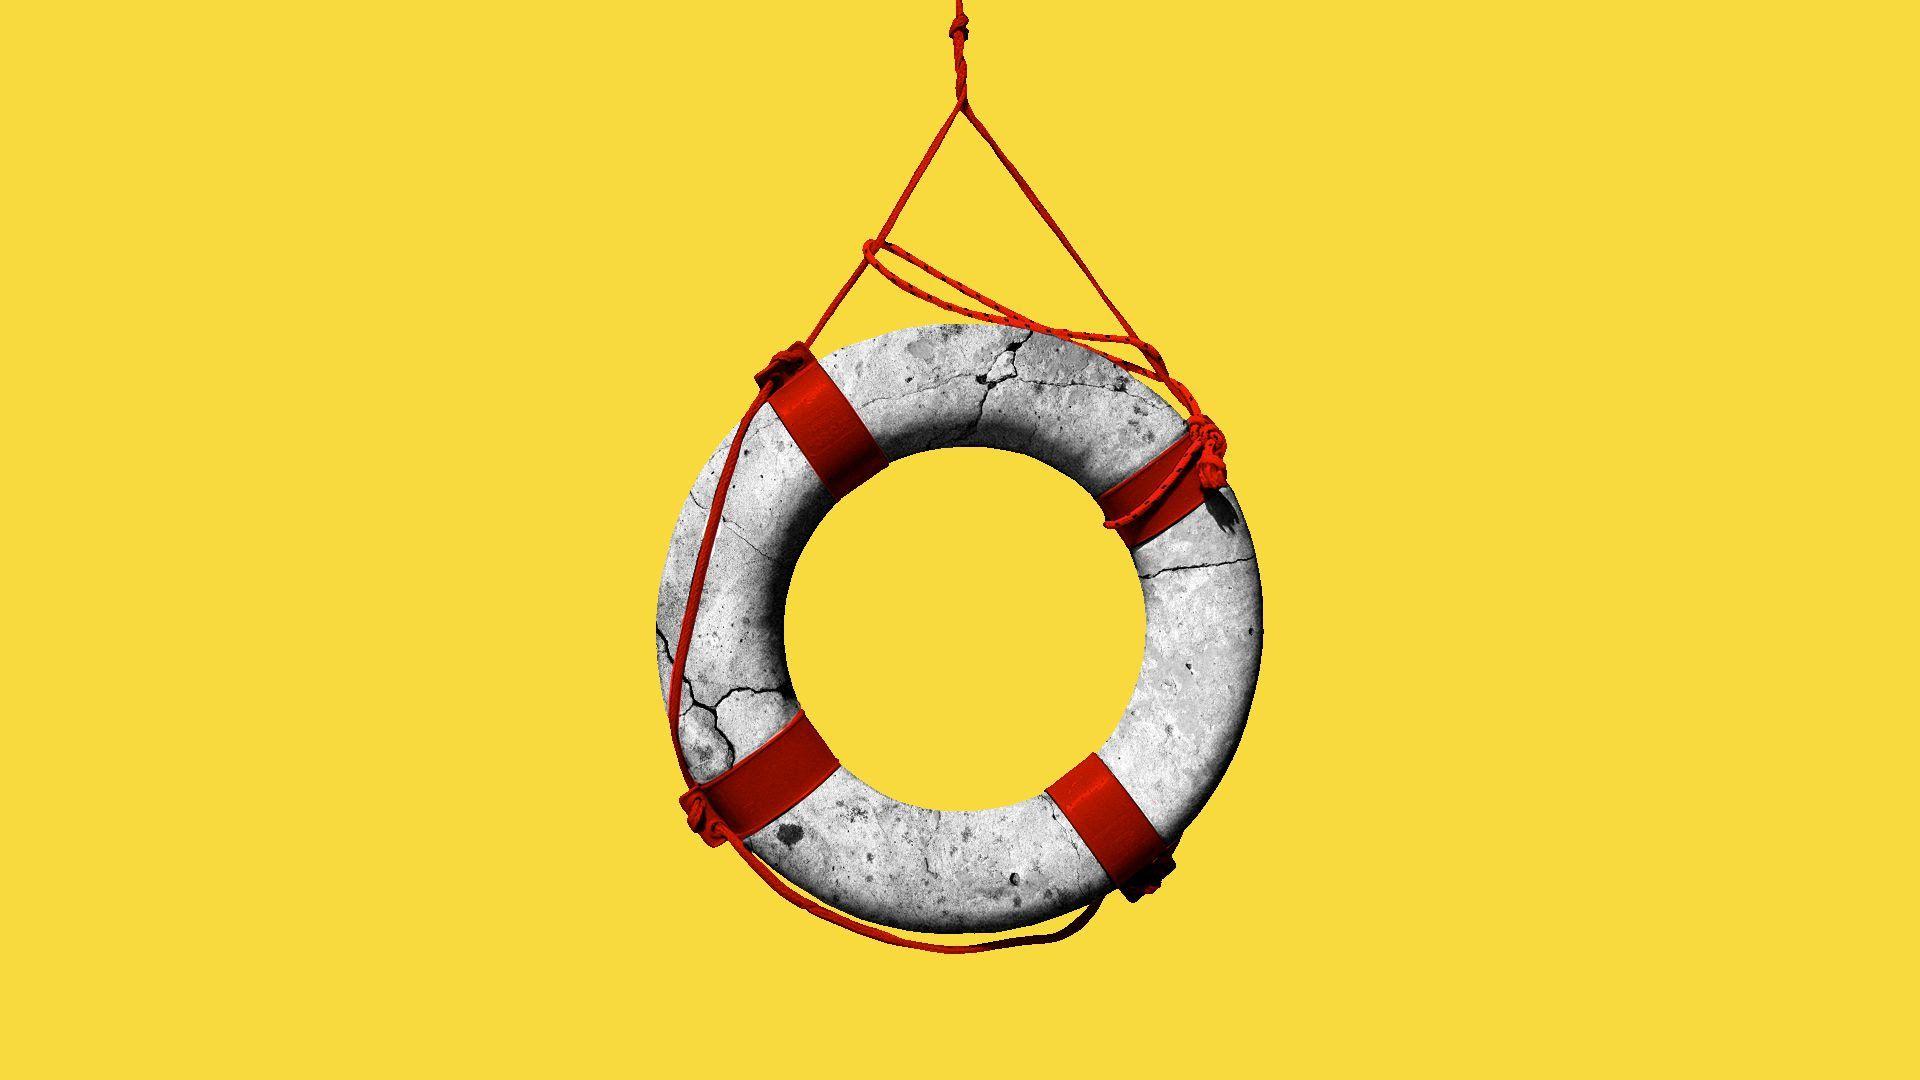 A deteriorating life raft